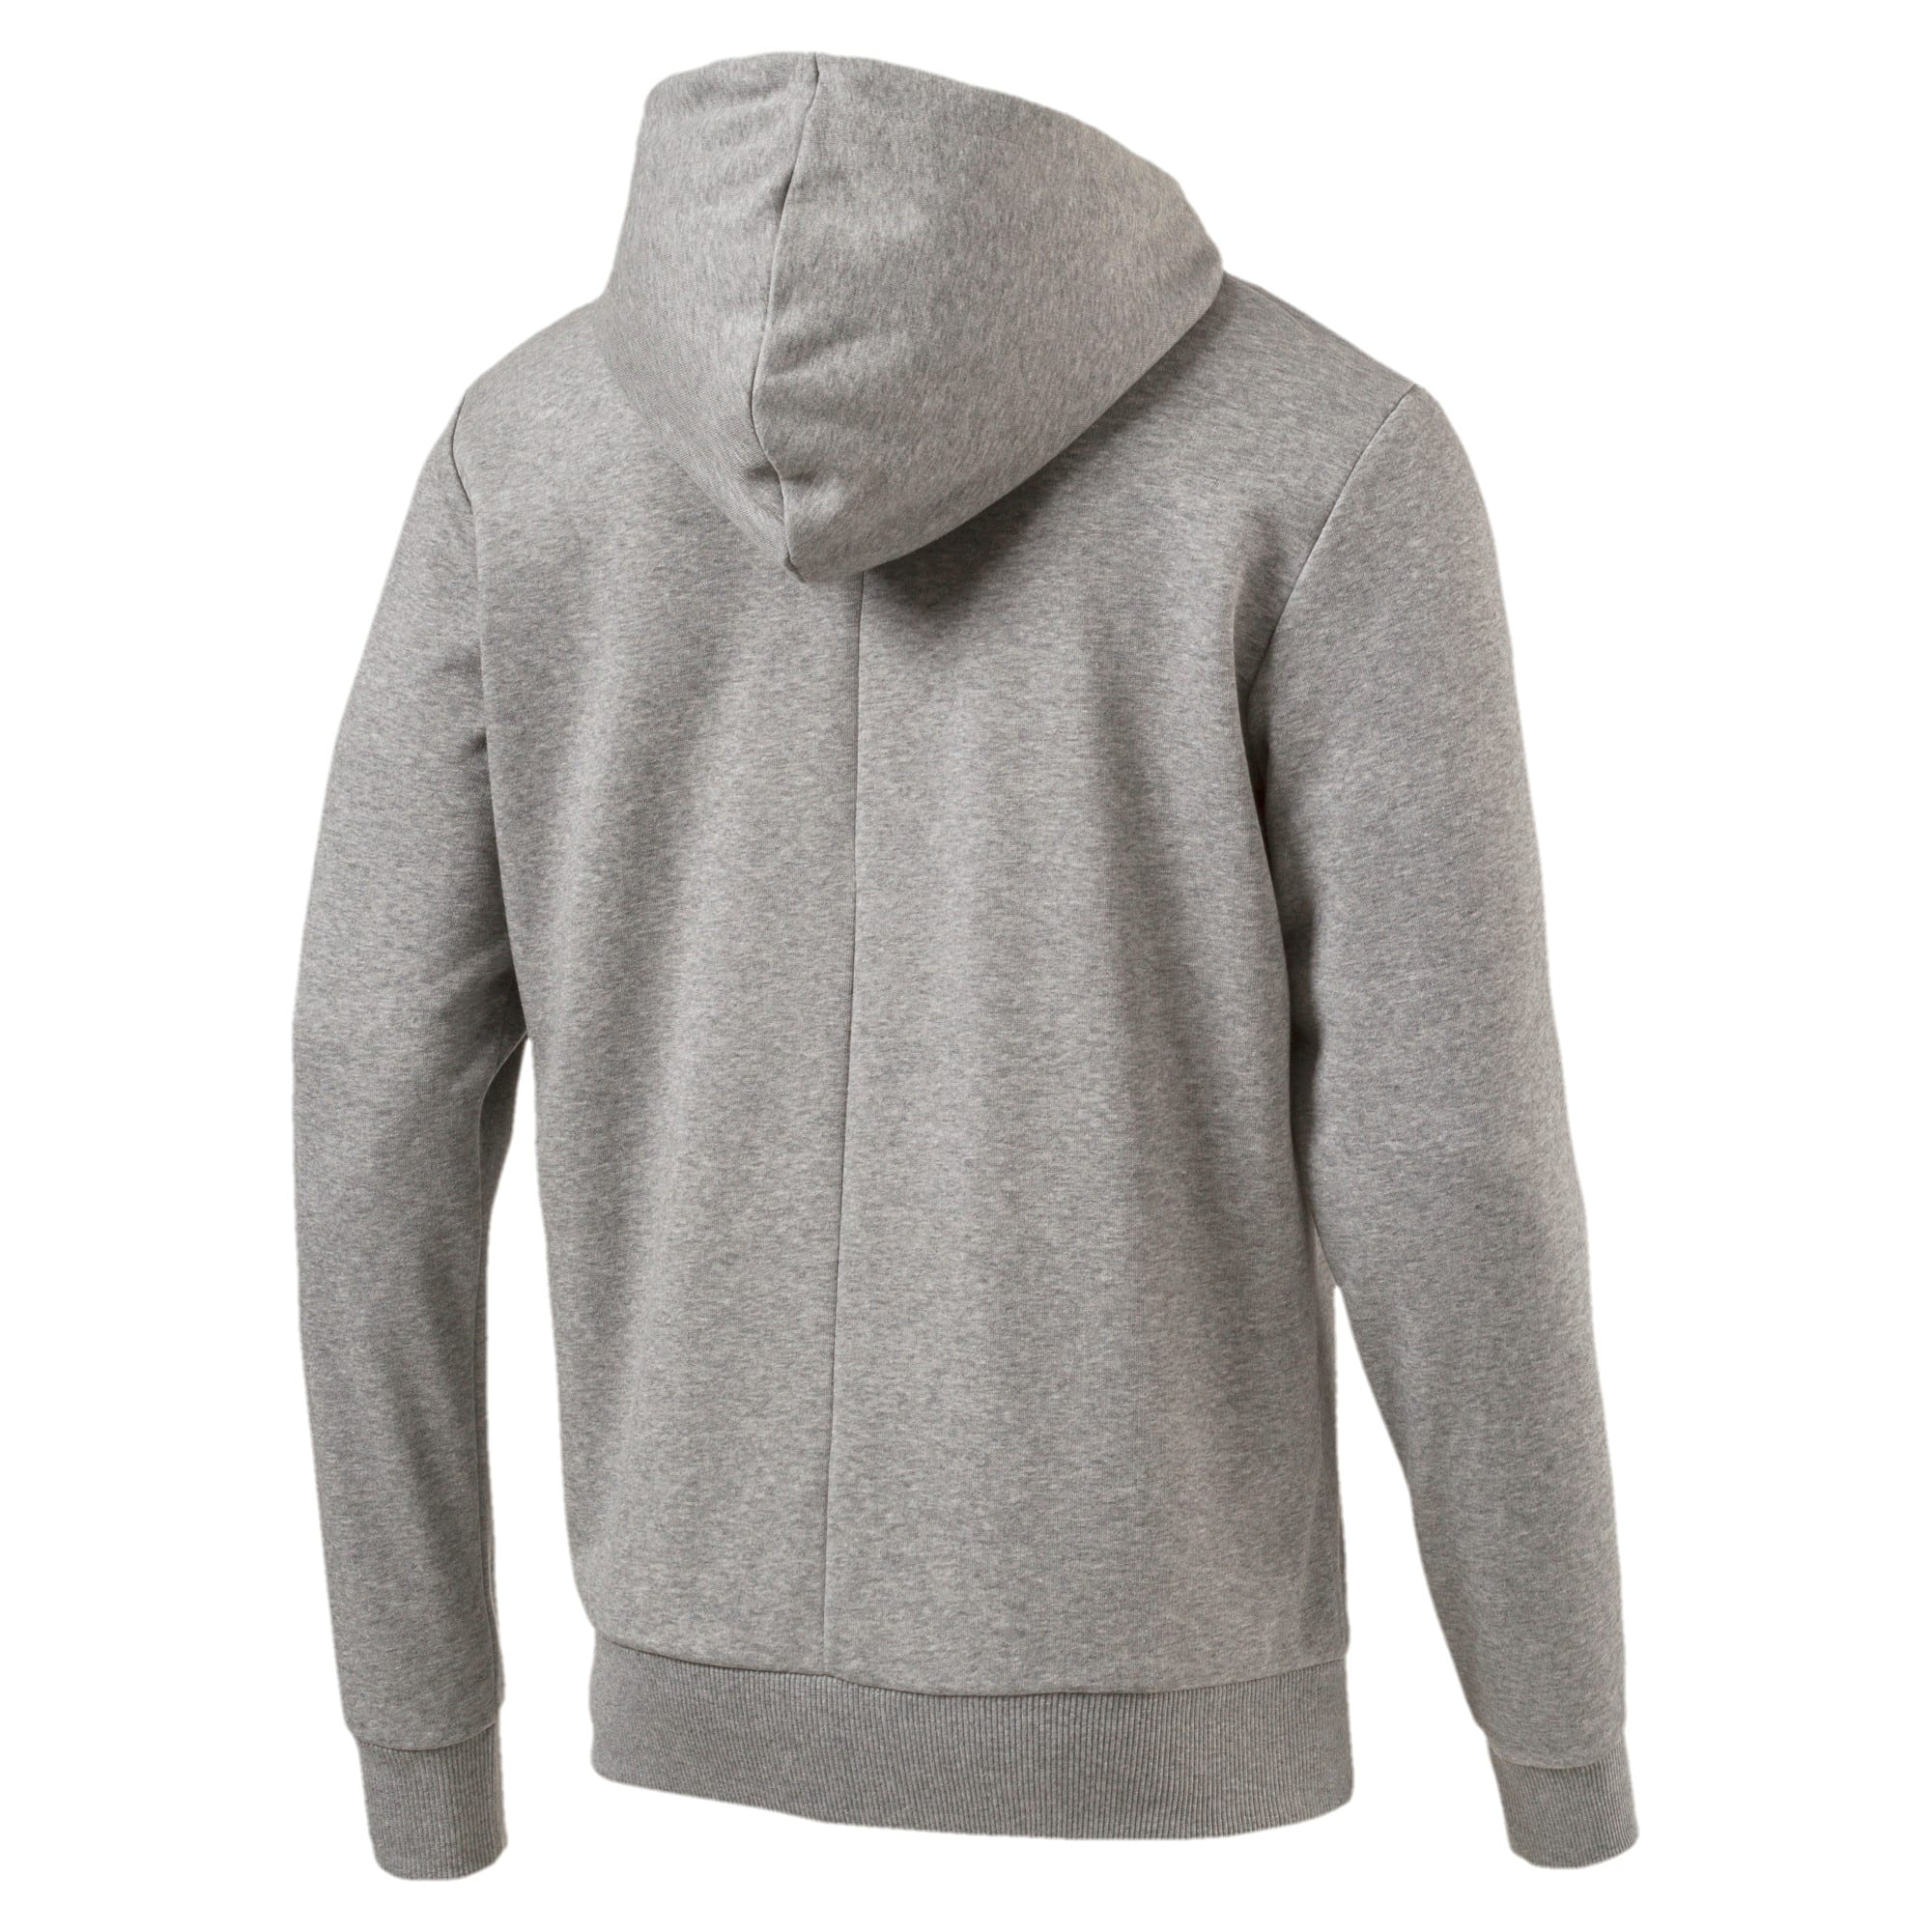 Thumbnail 3 of Red Bull Racing Lifestyle Men's Hooded Sweat Jacket, Medium Gray Heather - 1, medium